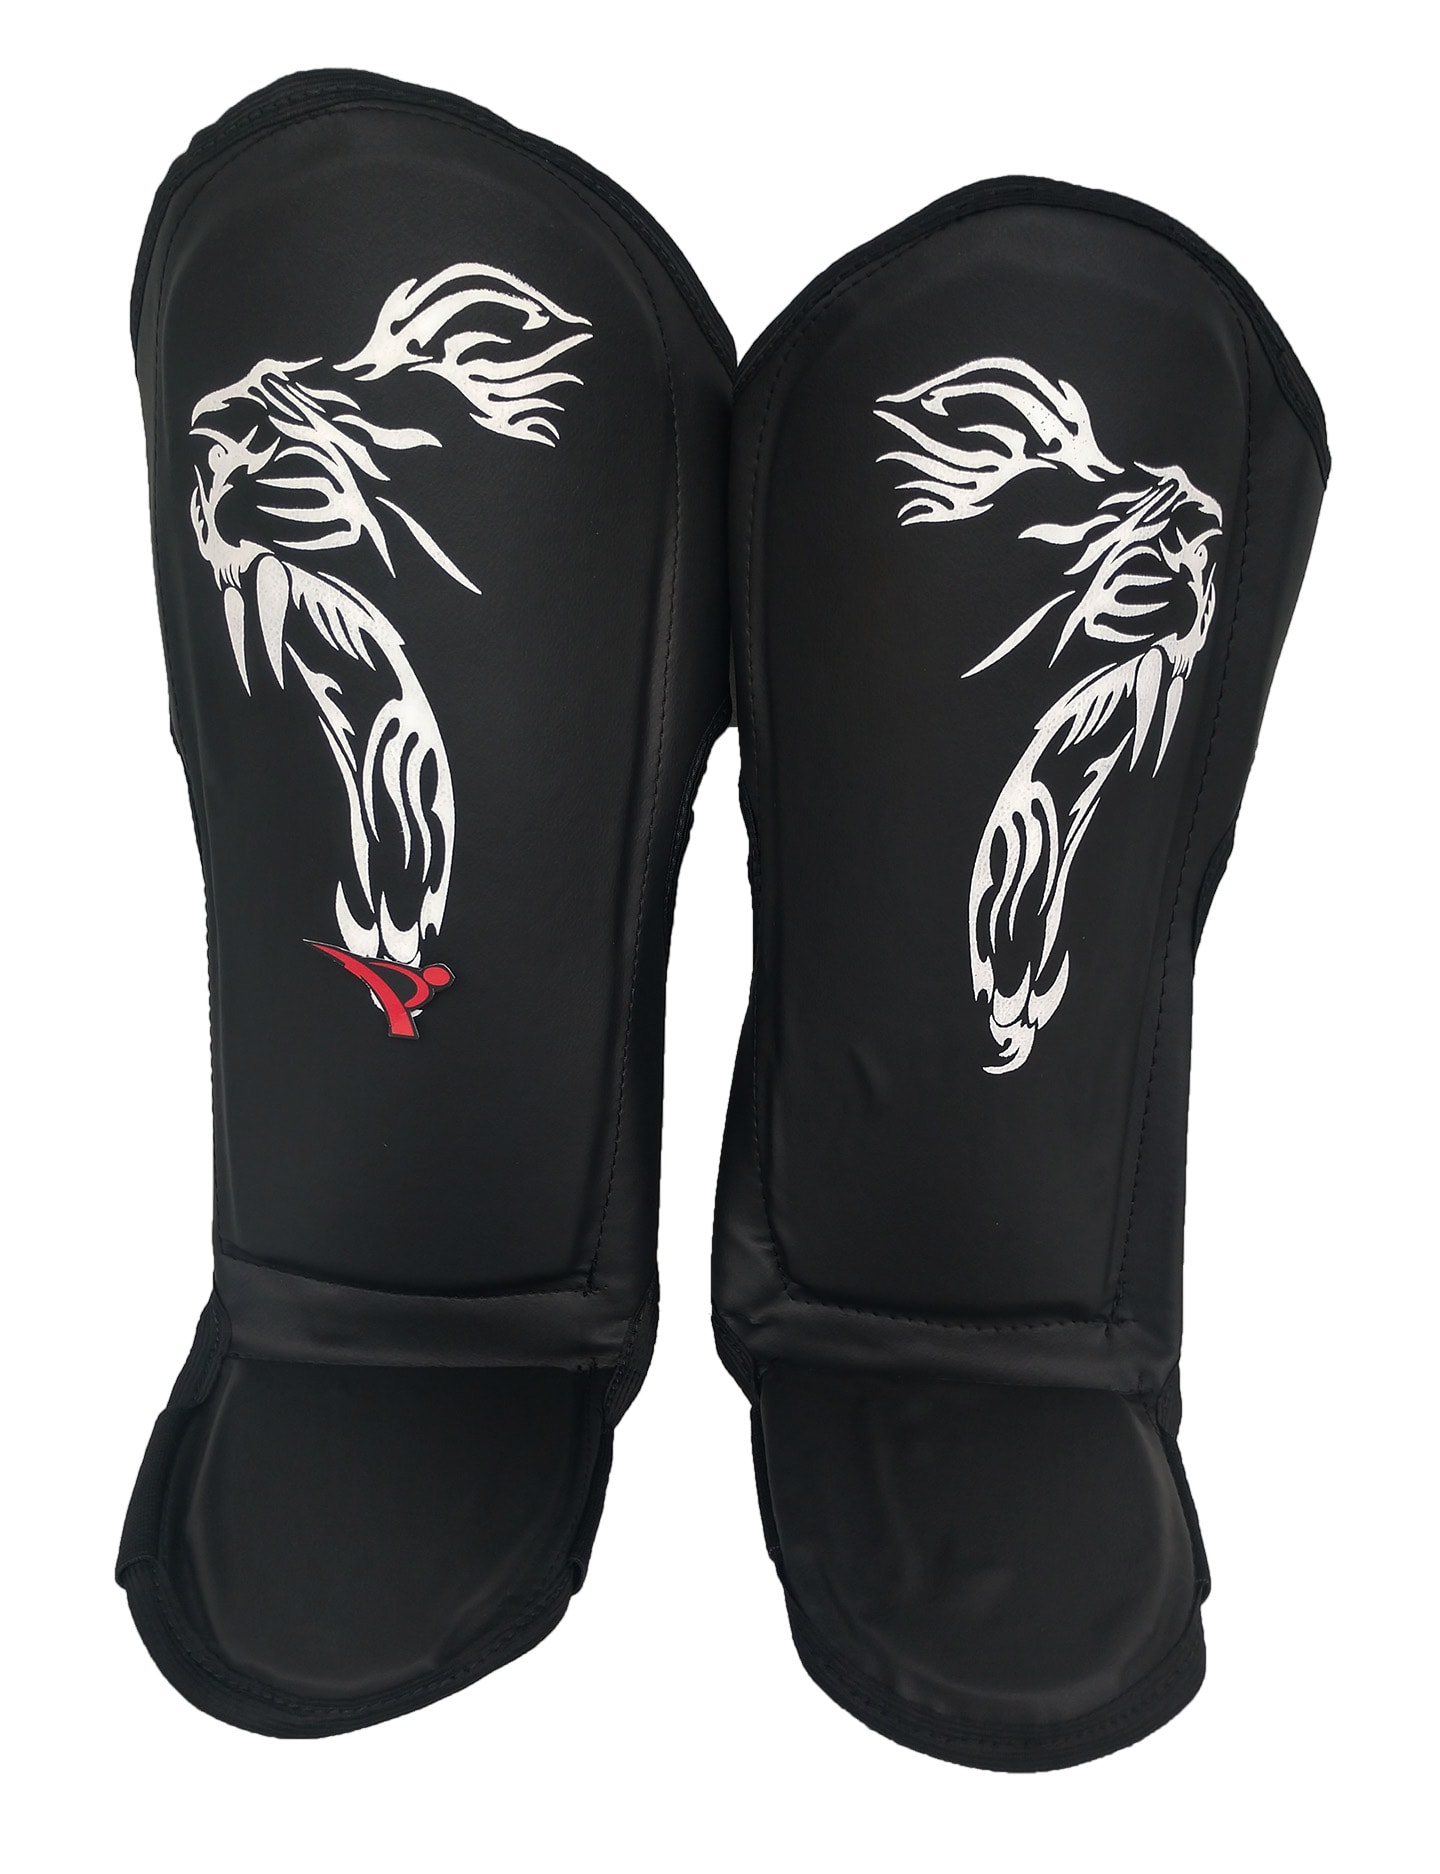 Caneleira Muay Thai Kickboxing Anatômica - Preto - MMA Brazuka  - PRALUTA SHOP